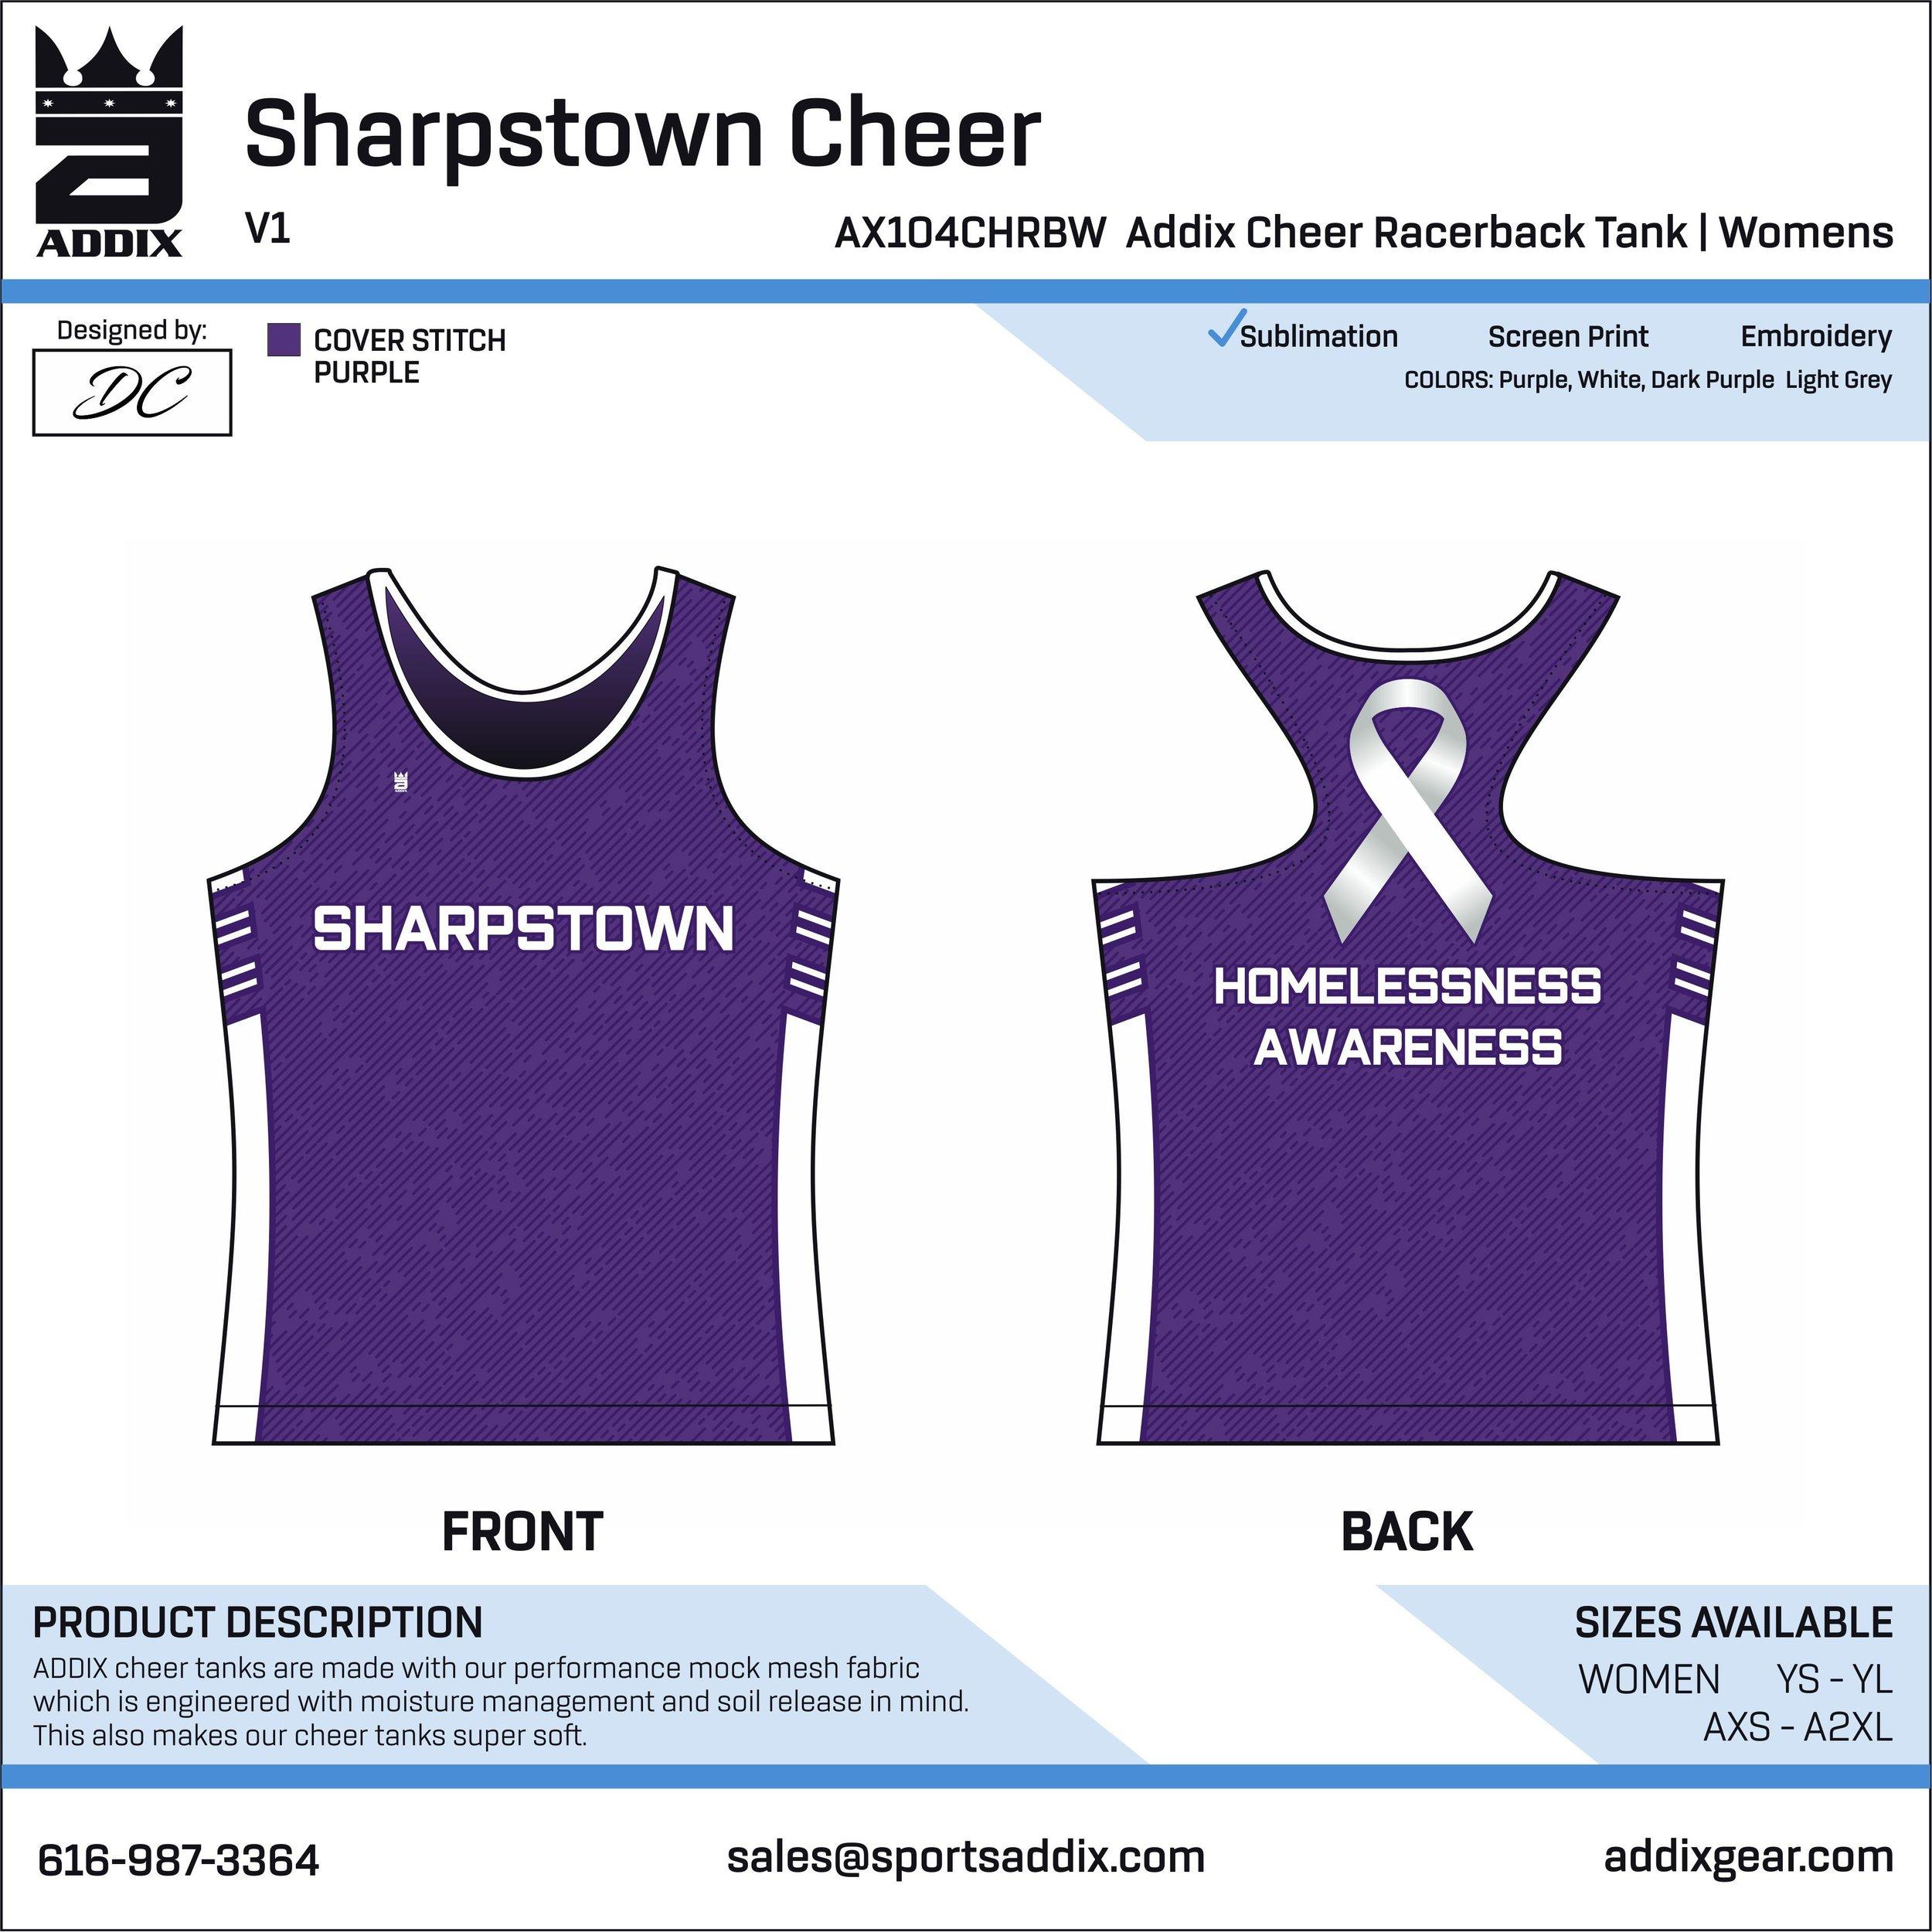 Sharpstown Cheer_2019_8-15_DC_Cheer Tank (1).jpg